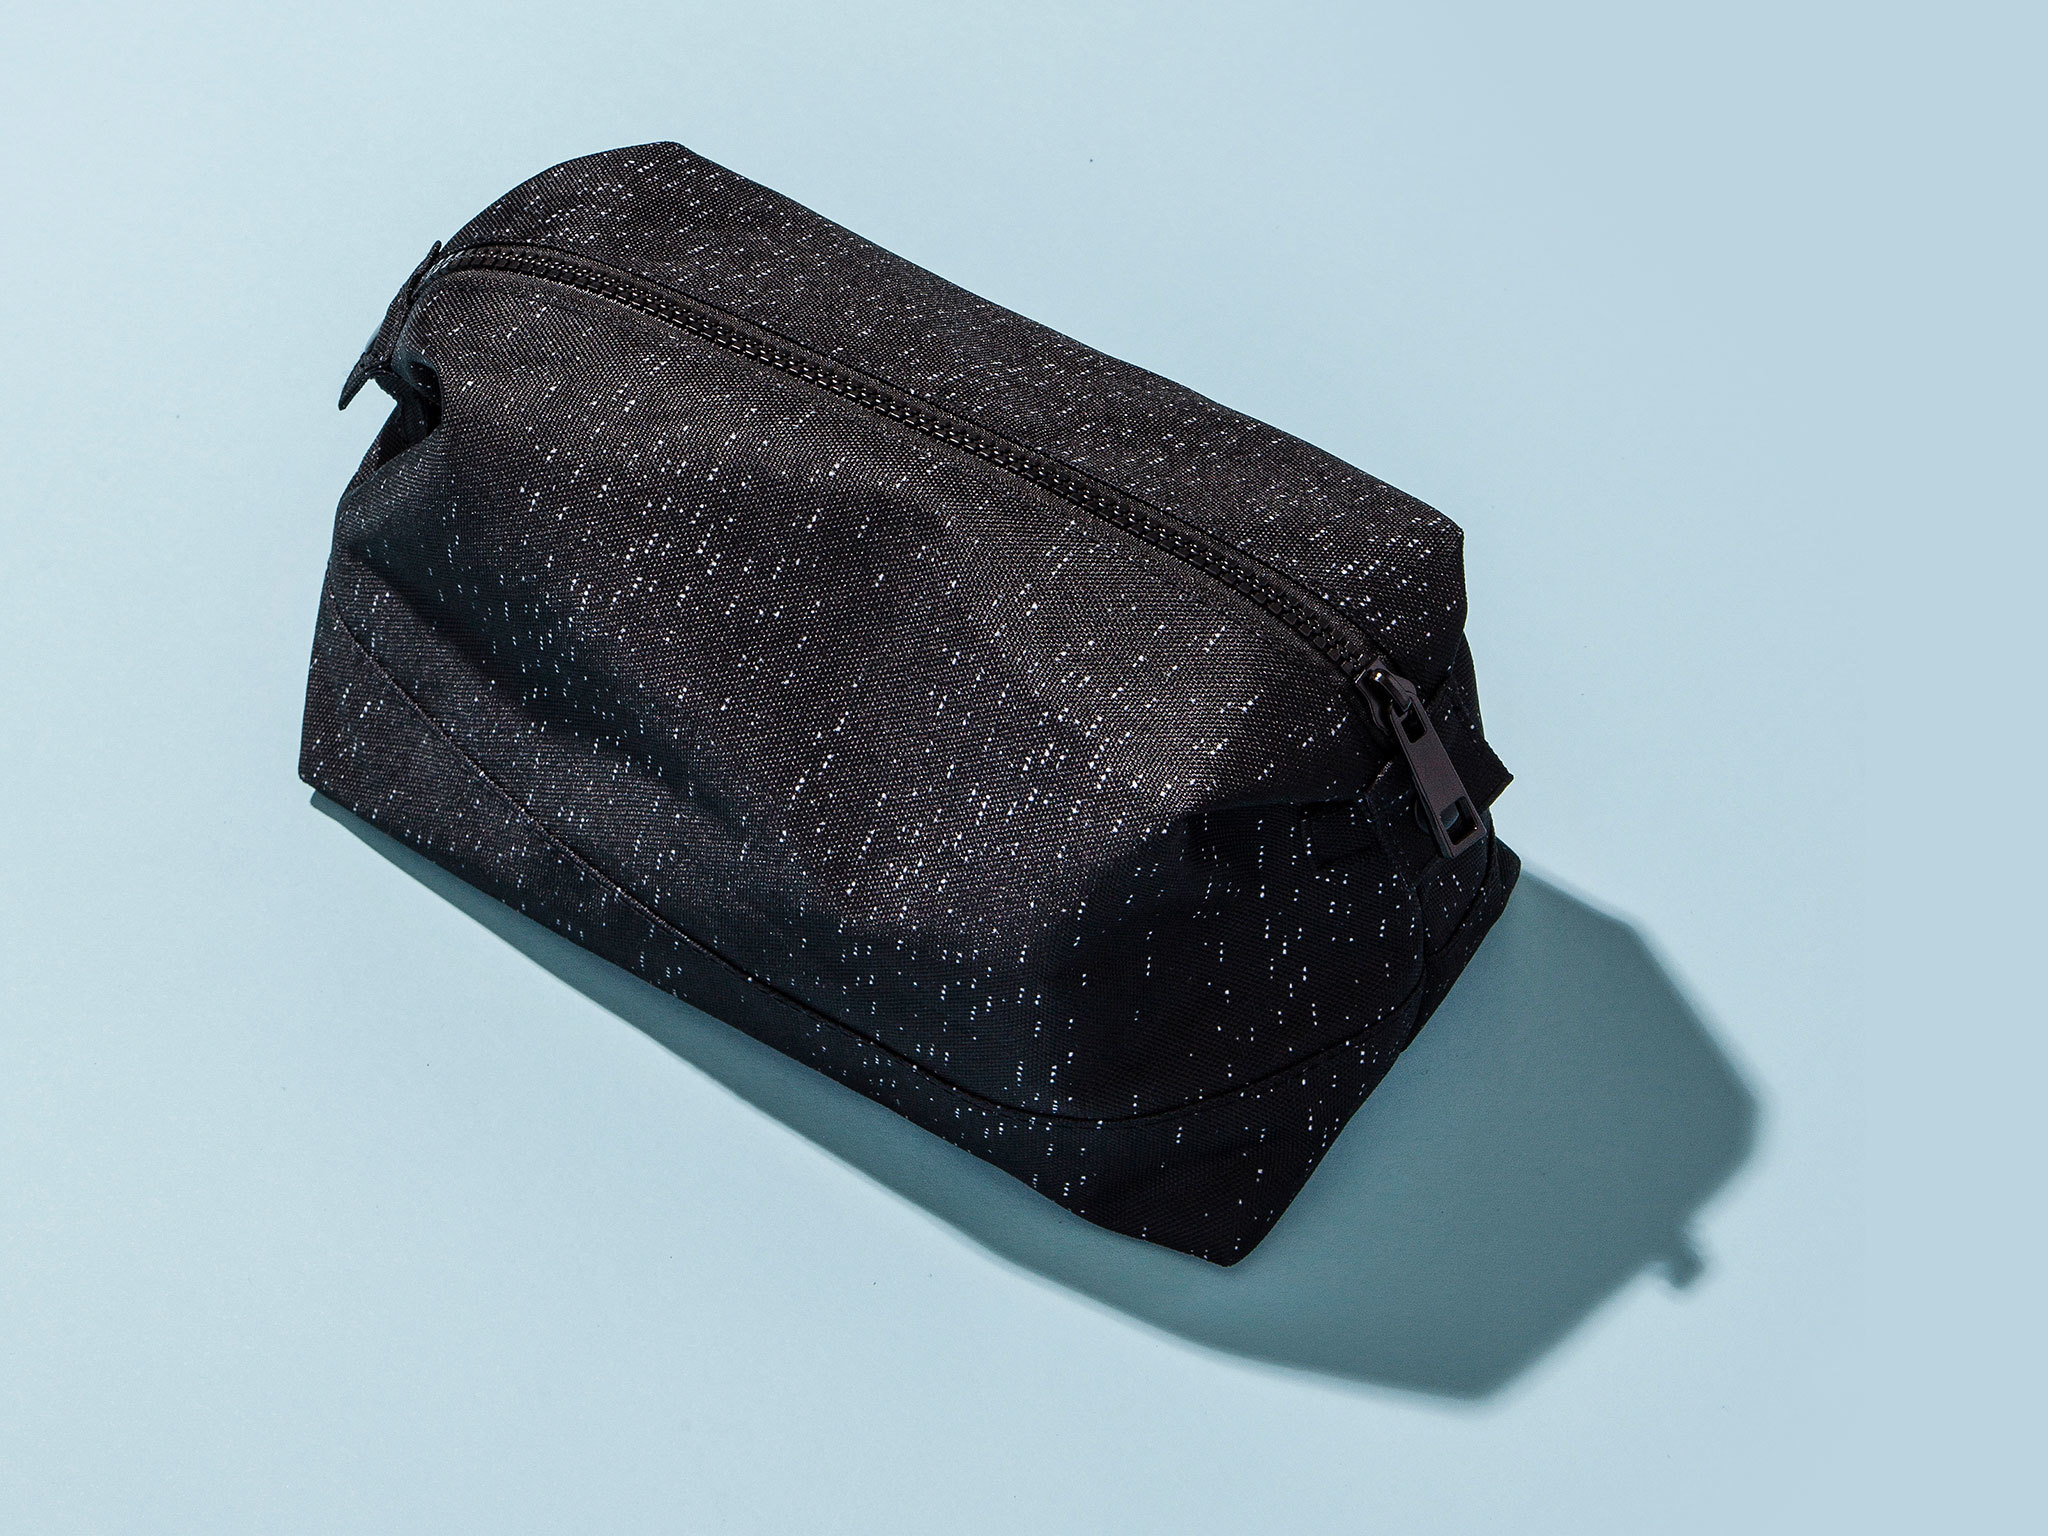 Speckled washbag by Topman